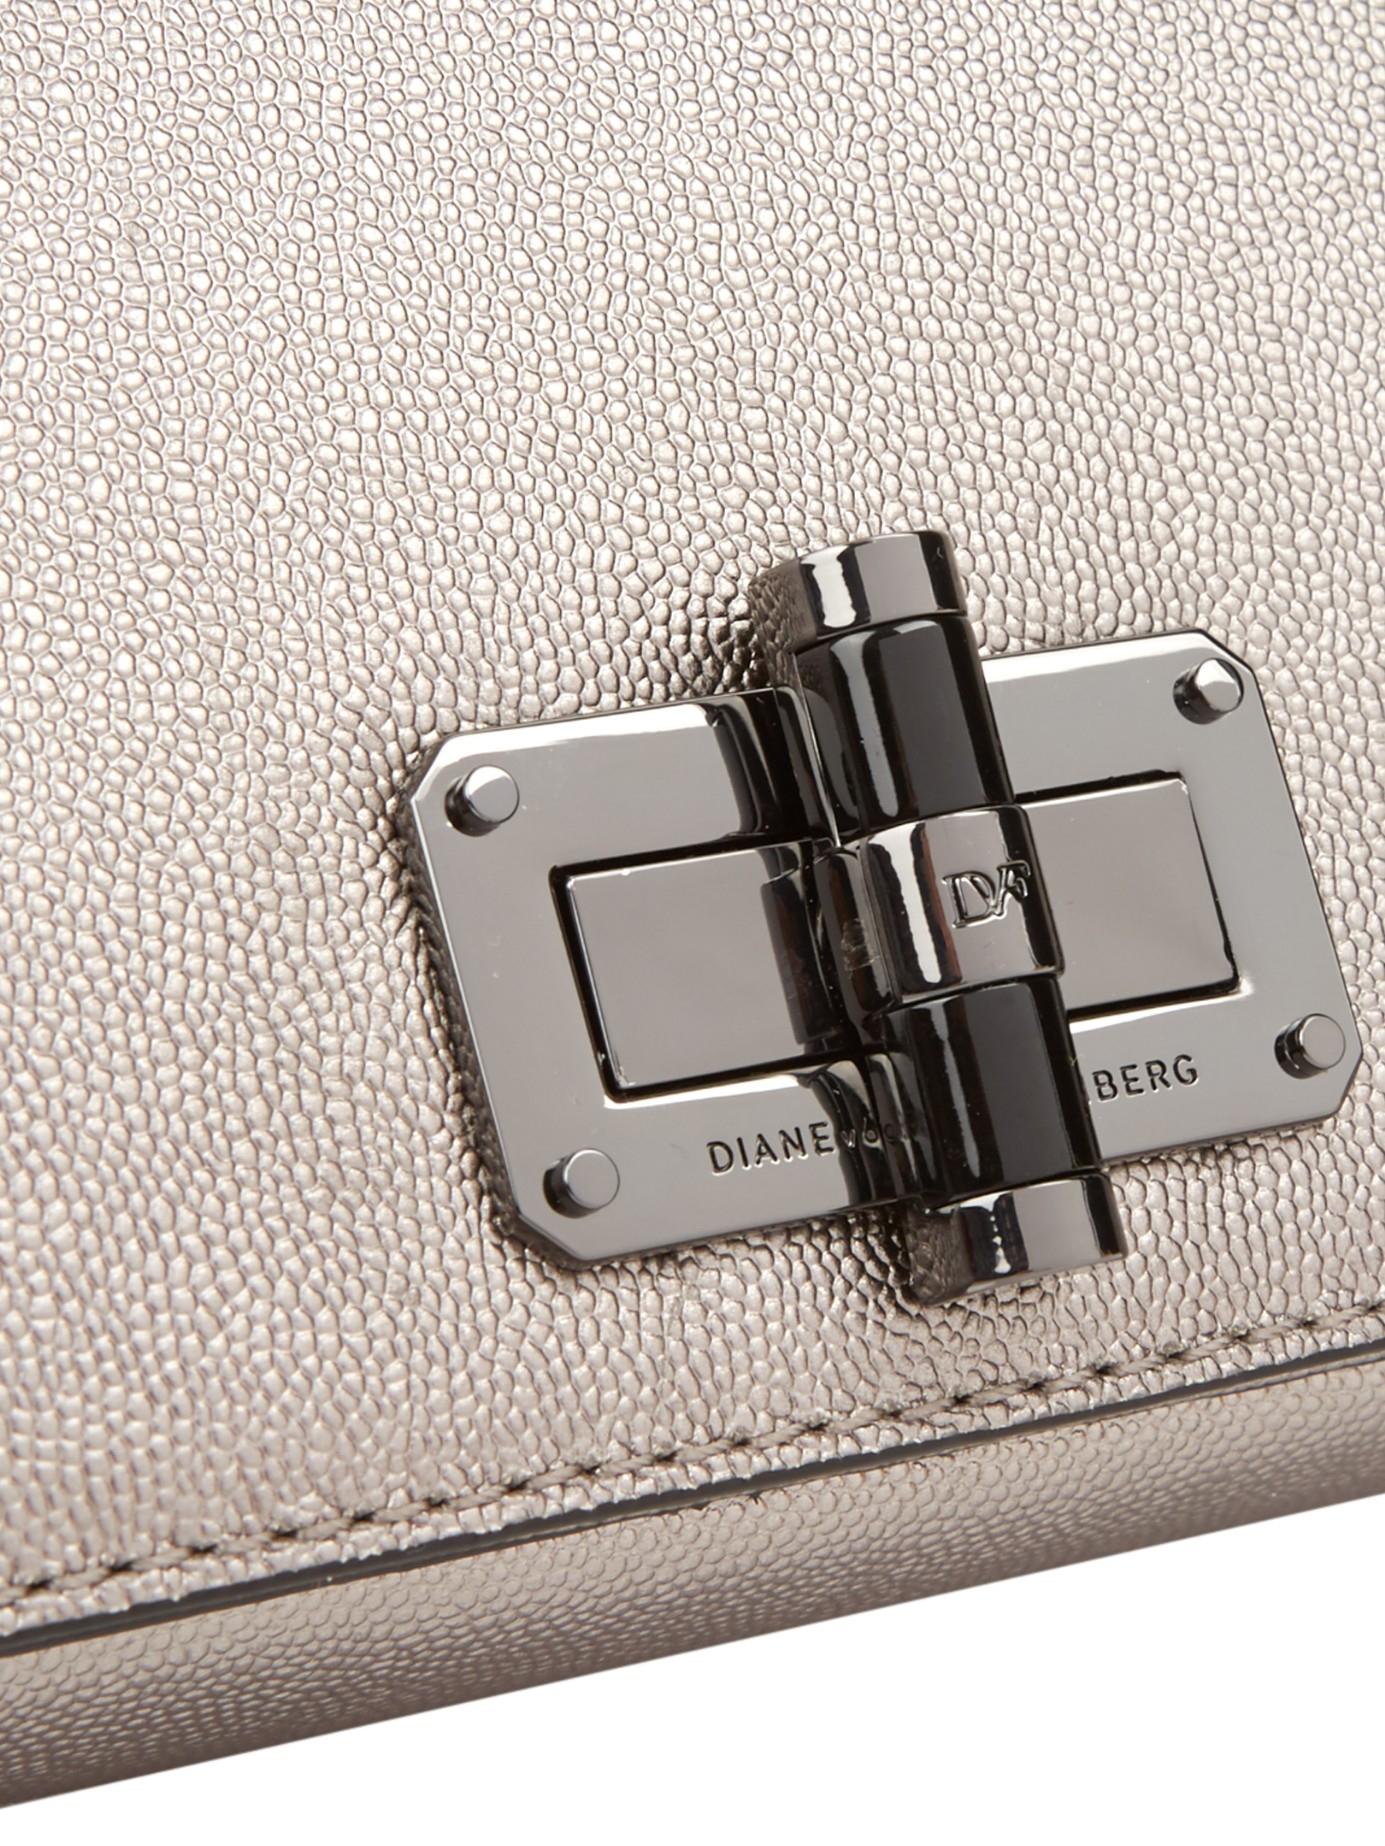 Diane von Furstenberg 440 Gallery Bellini Cross-body Bag in Silver (Metallic)